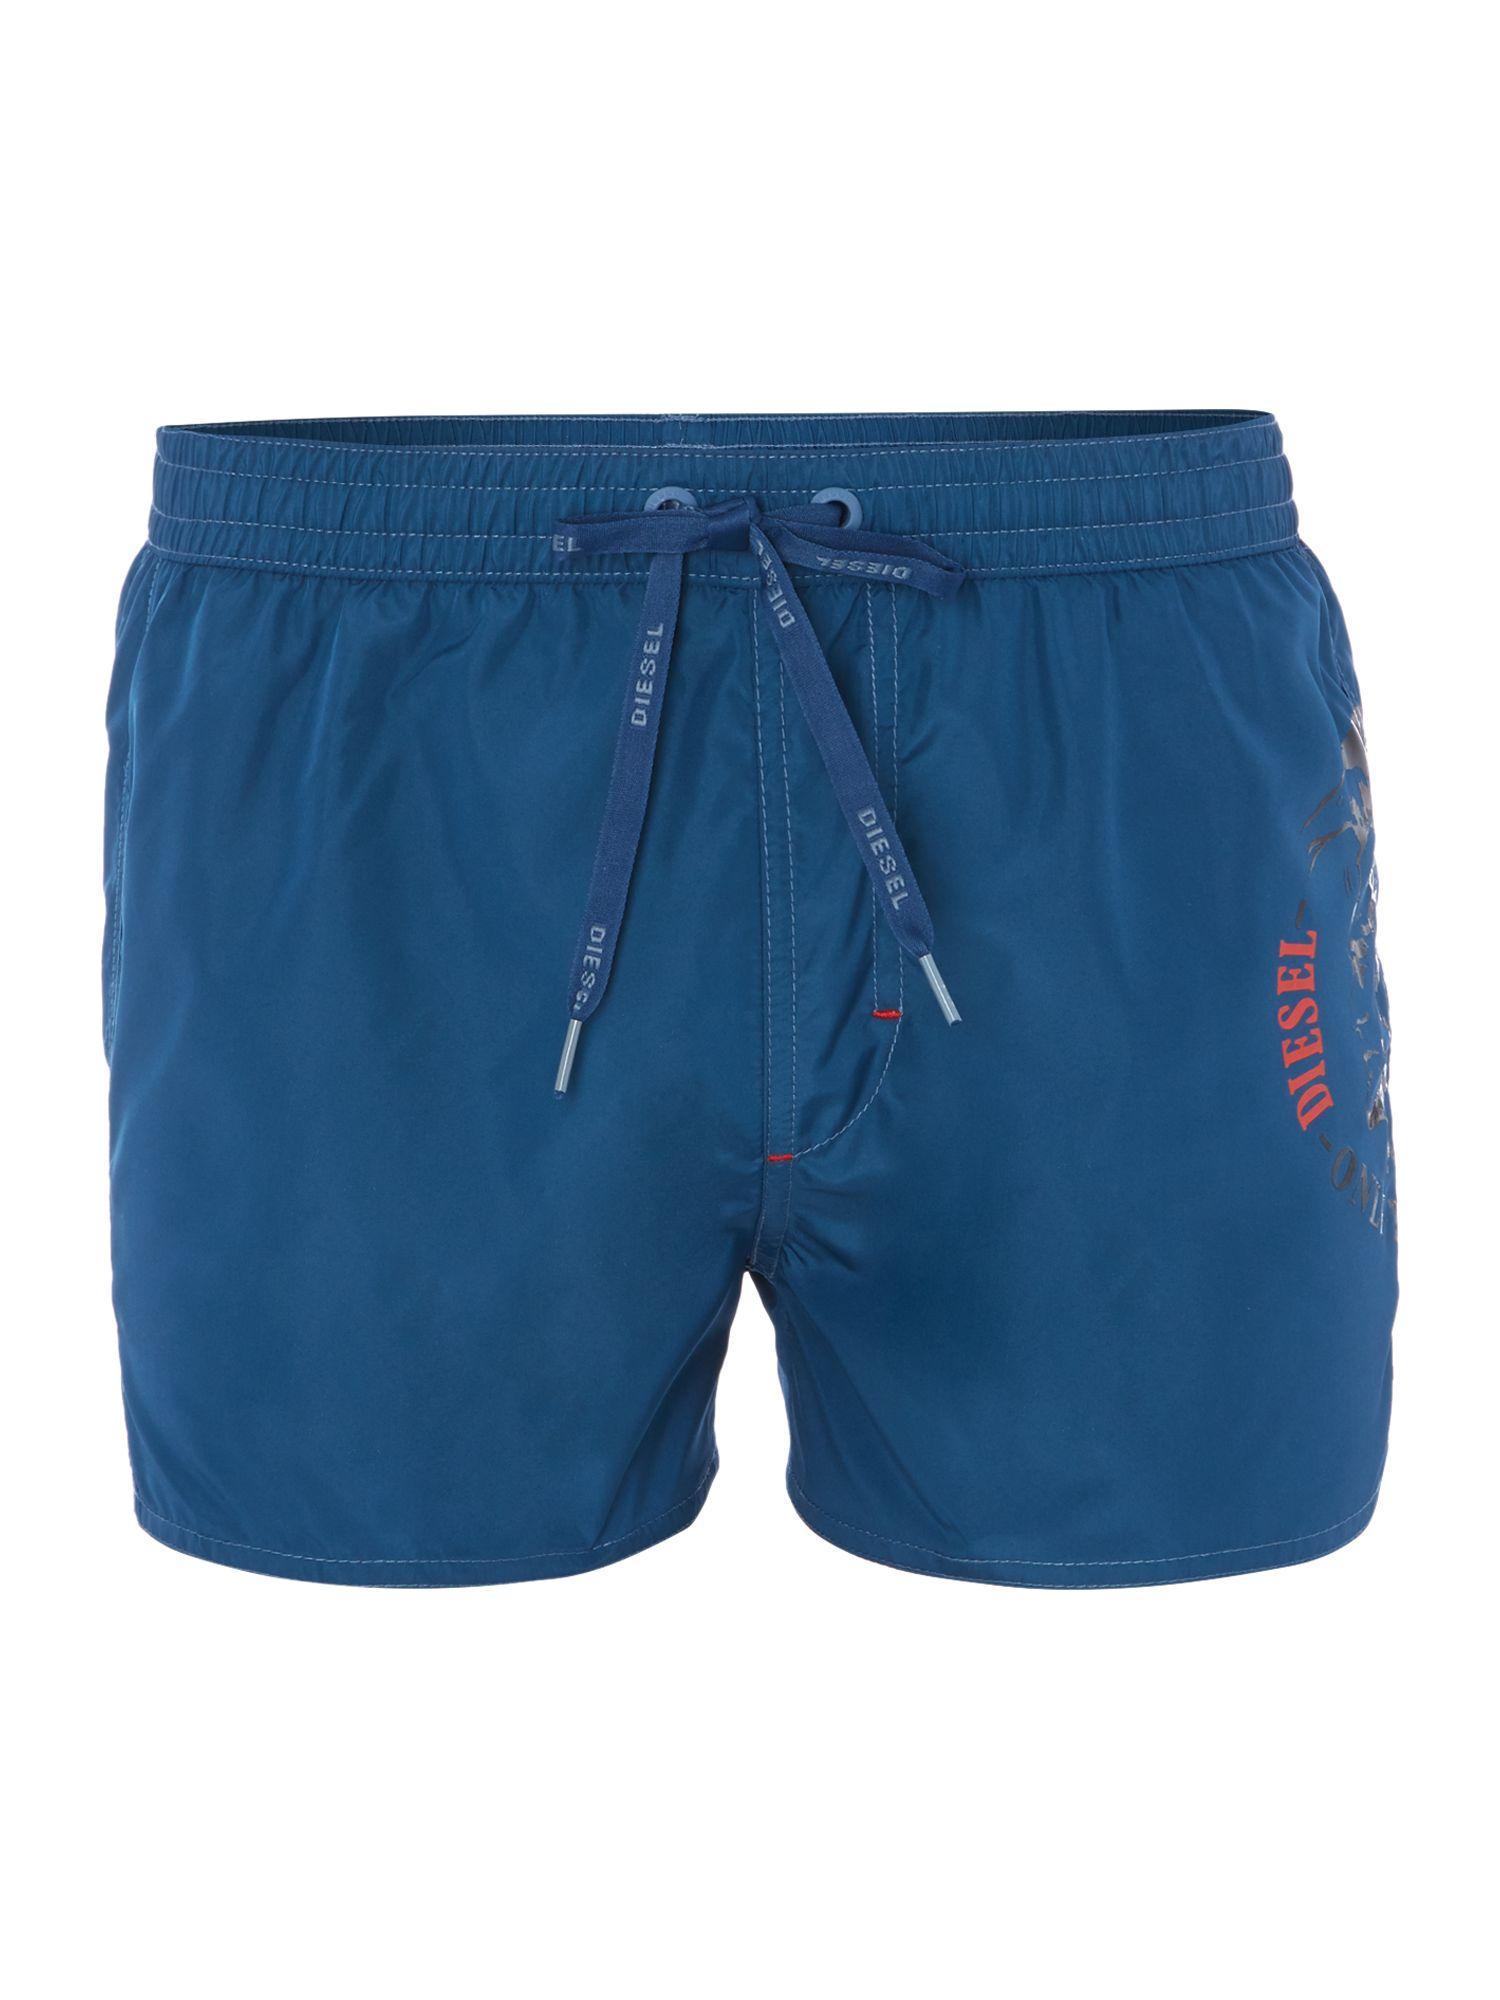 eb27d0f32000b Diesel Coralrif Short Length Swim Short in Blue for Men - Lyst